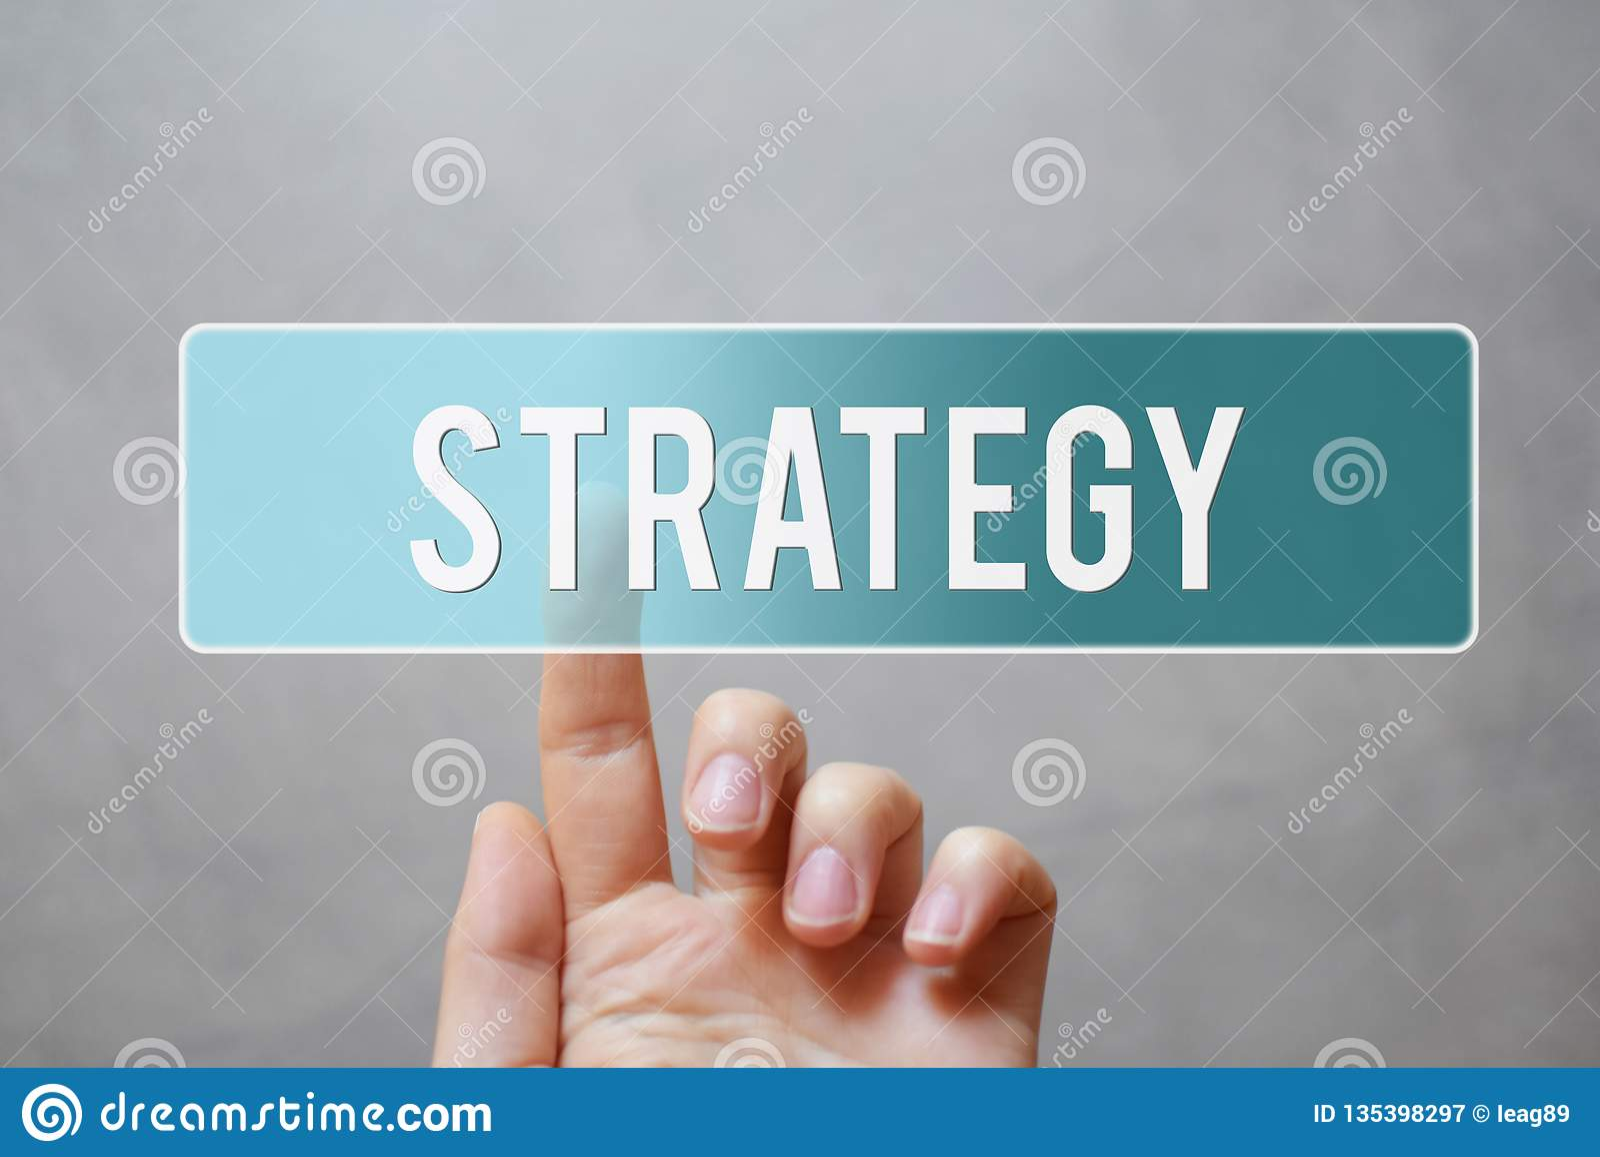 Strategy - finger pressing blue transparent button